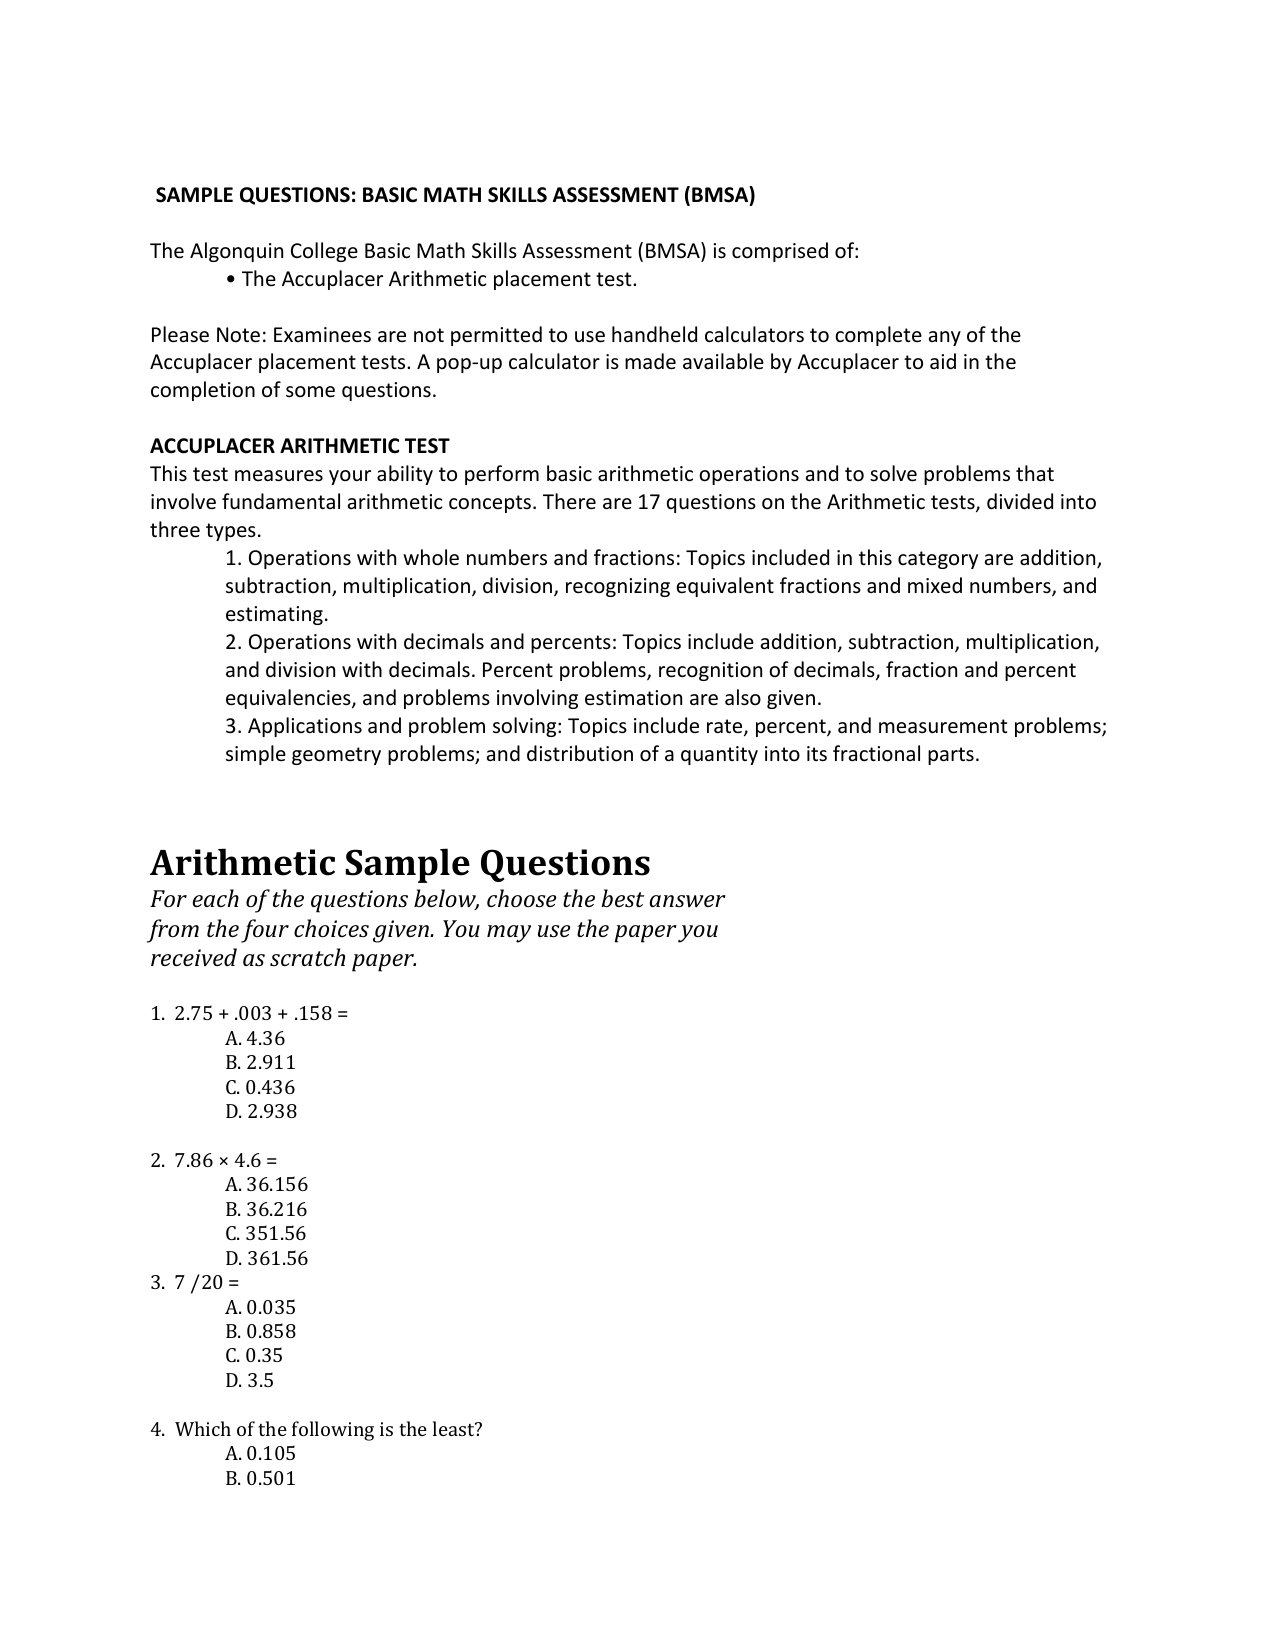 Arithmetic Sample Questions